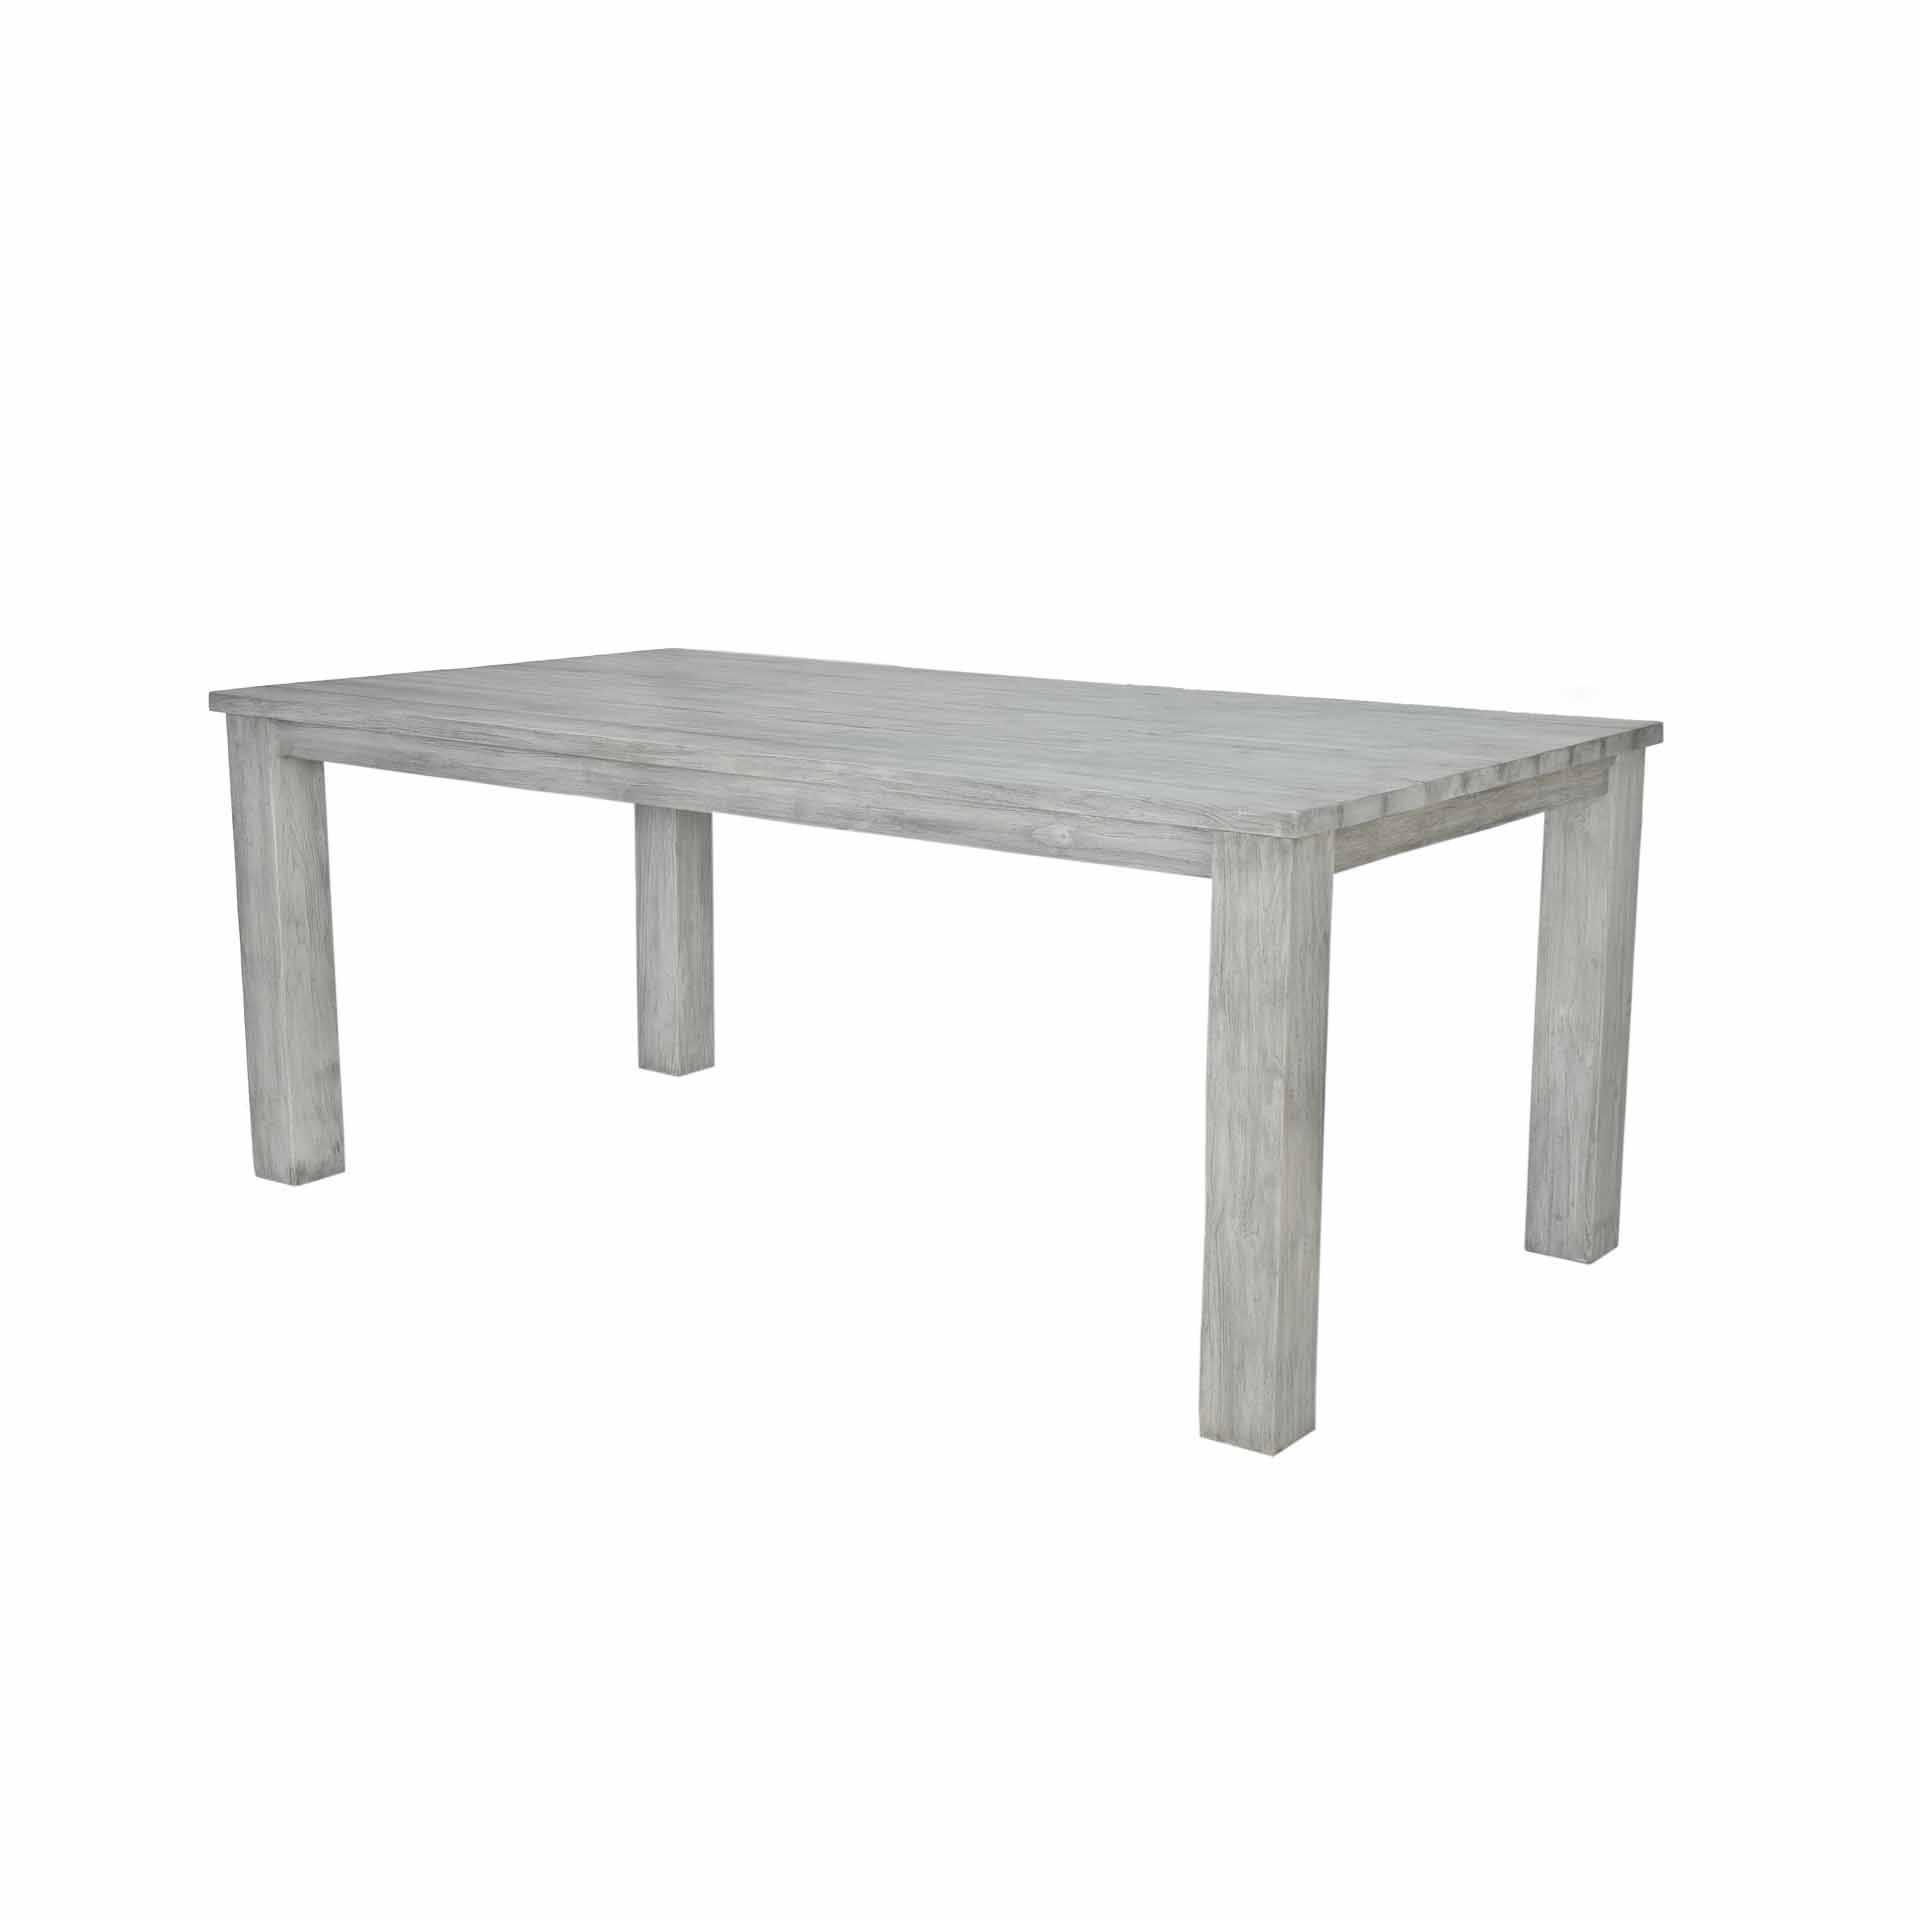 Kingsley Bate Valhalla 73 39 Rectangular Dining Table